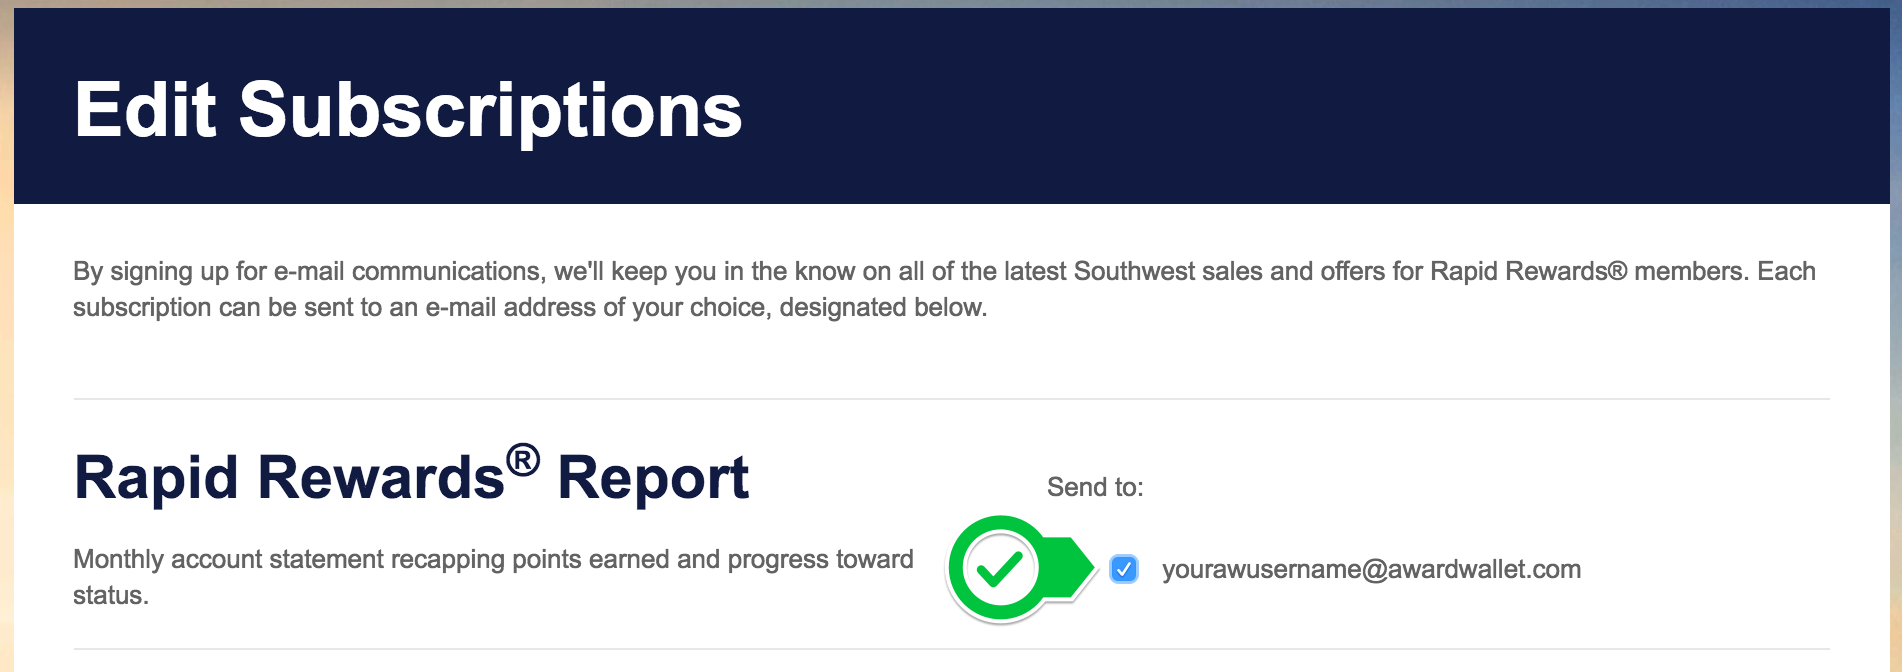 southwest-member-communication-preferences